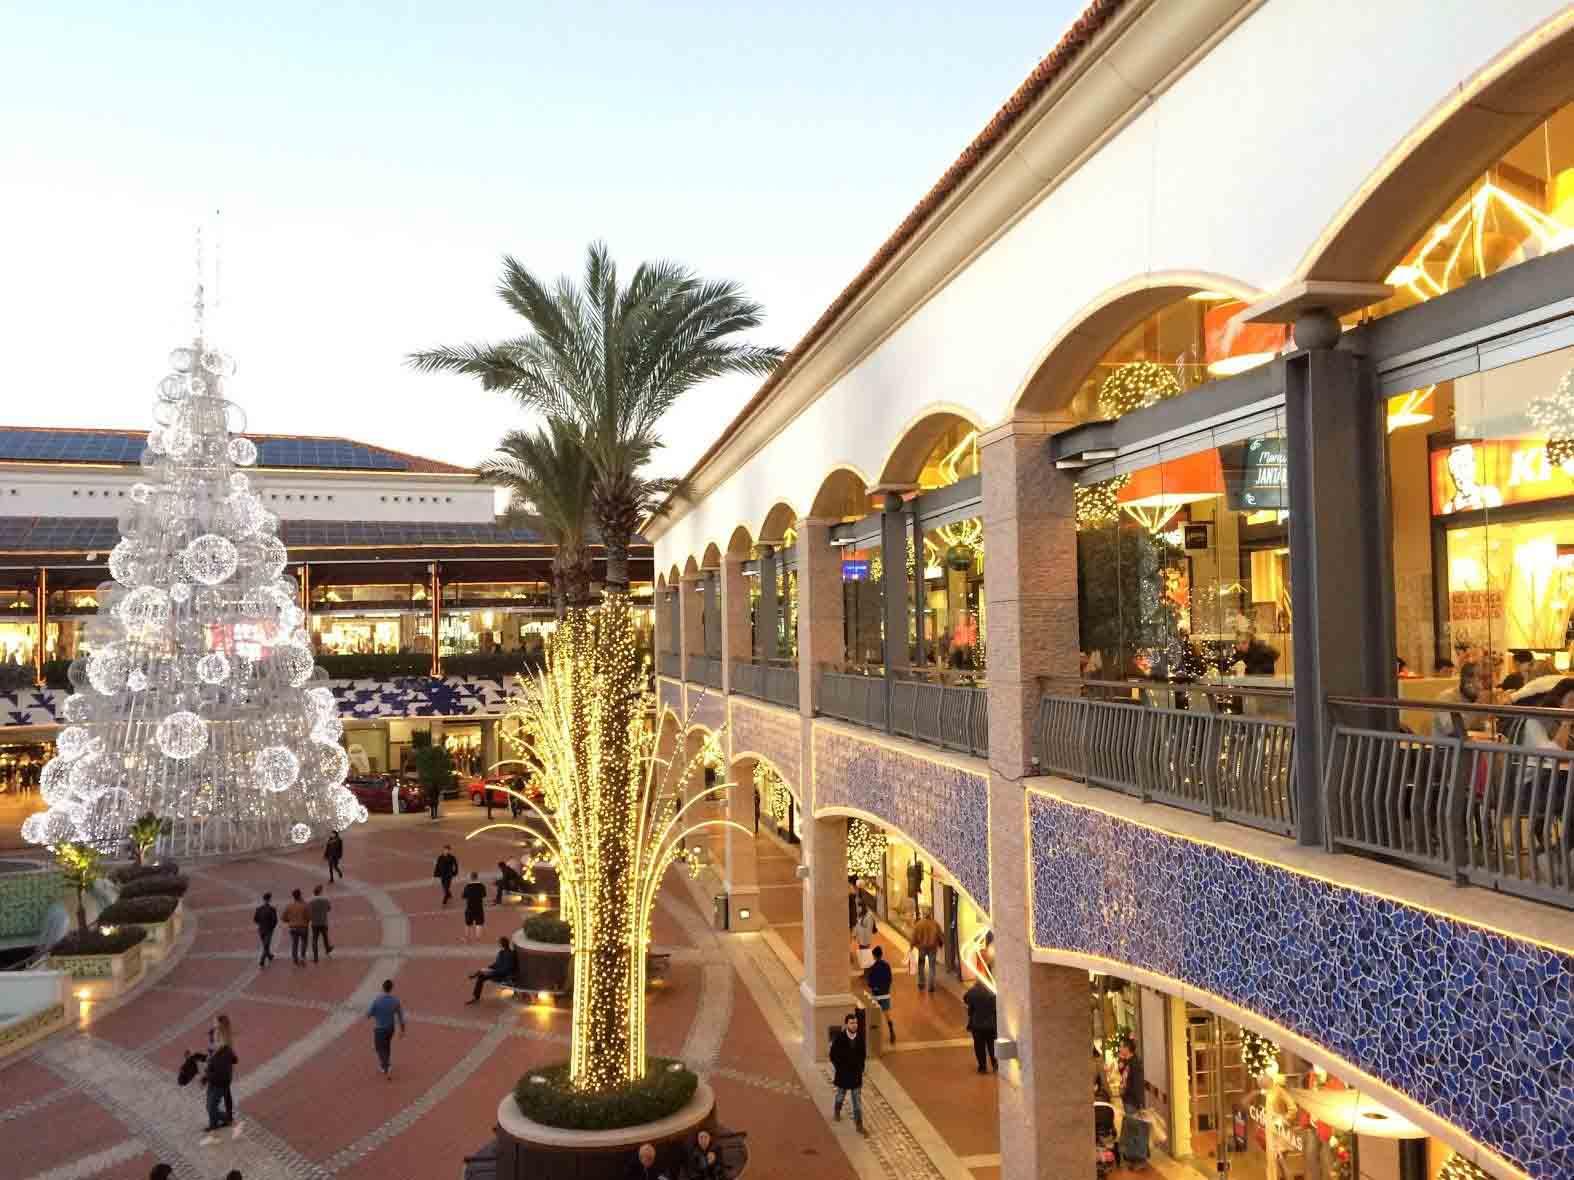 forum algarve in december christmas - Christmas In Portugal